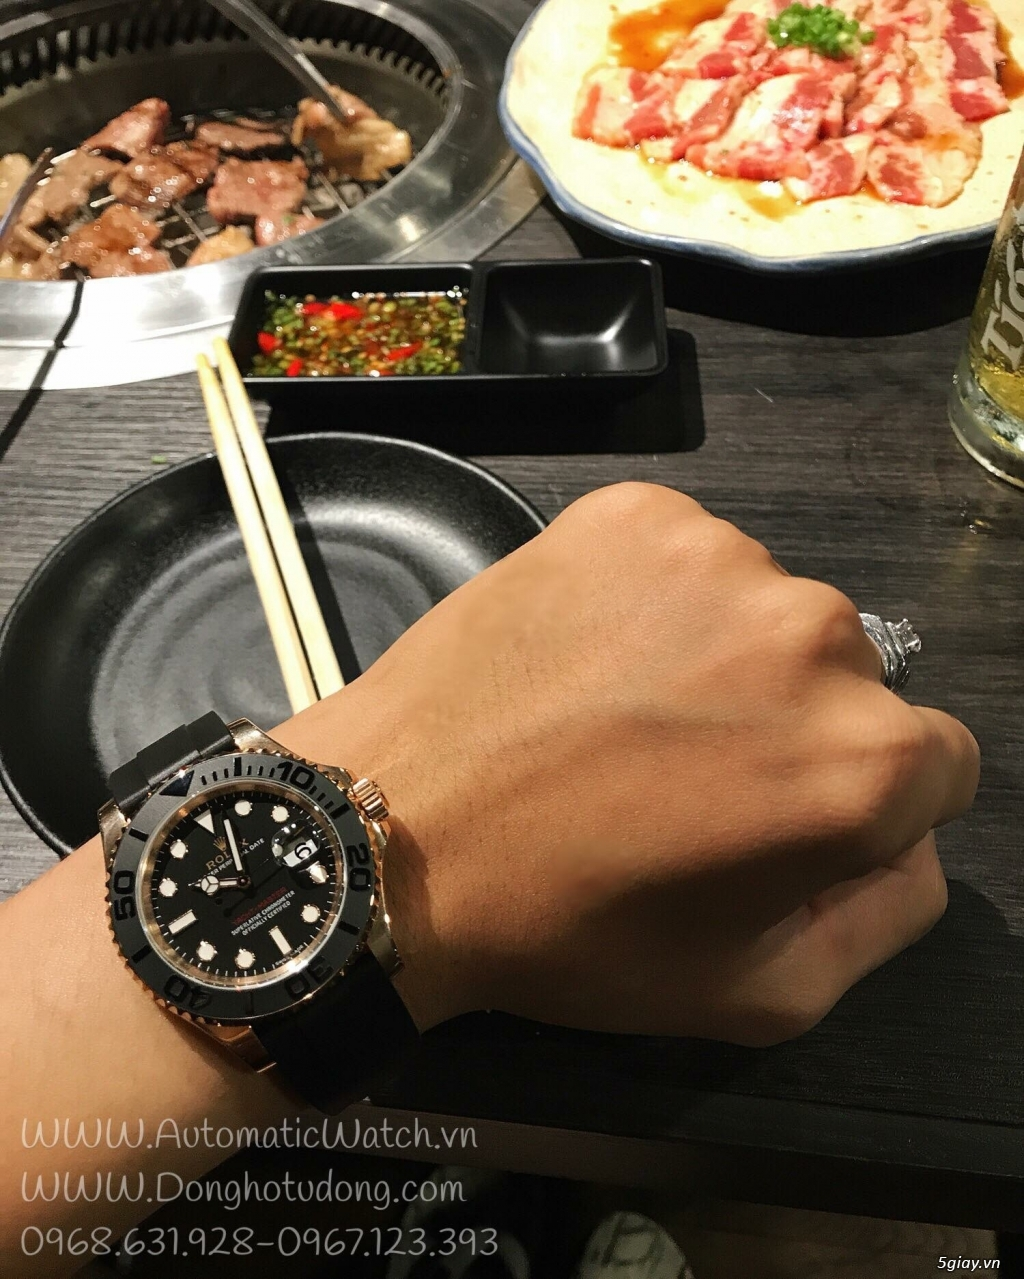 Chuyên đồng hồ Rolex,Hublot,AP, Patek Philippe...Replica1:1 Swiss Made - 40